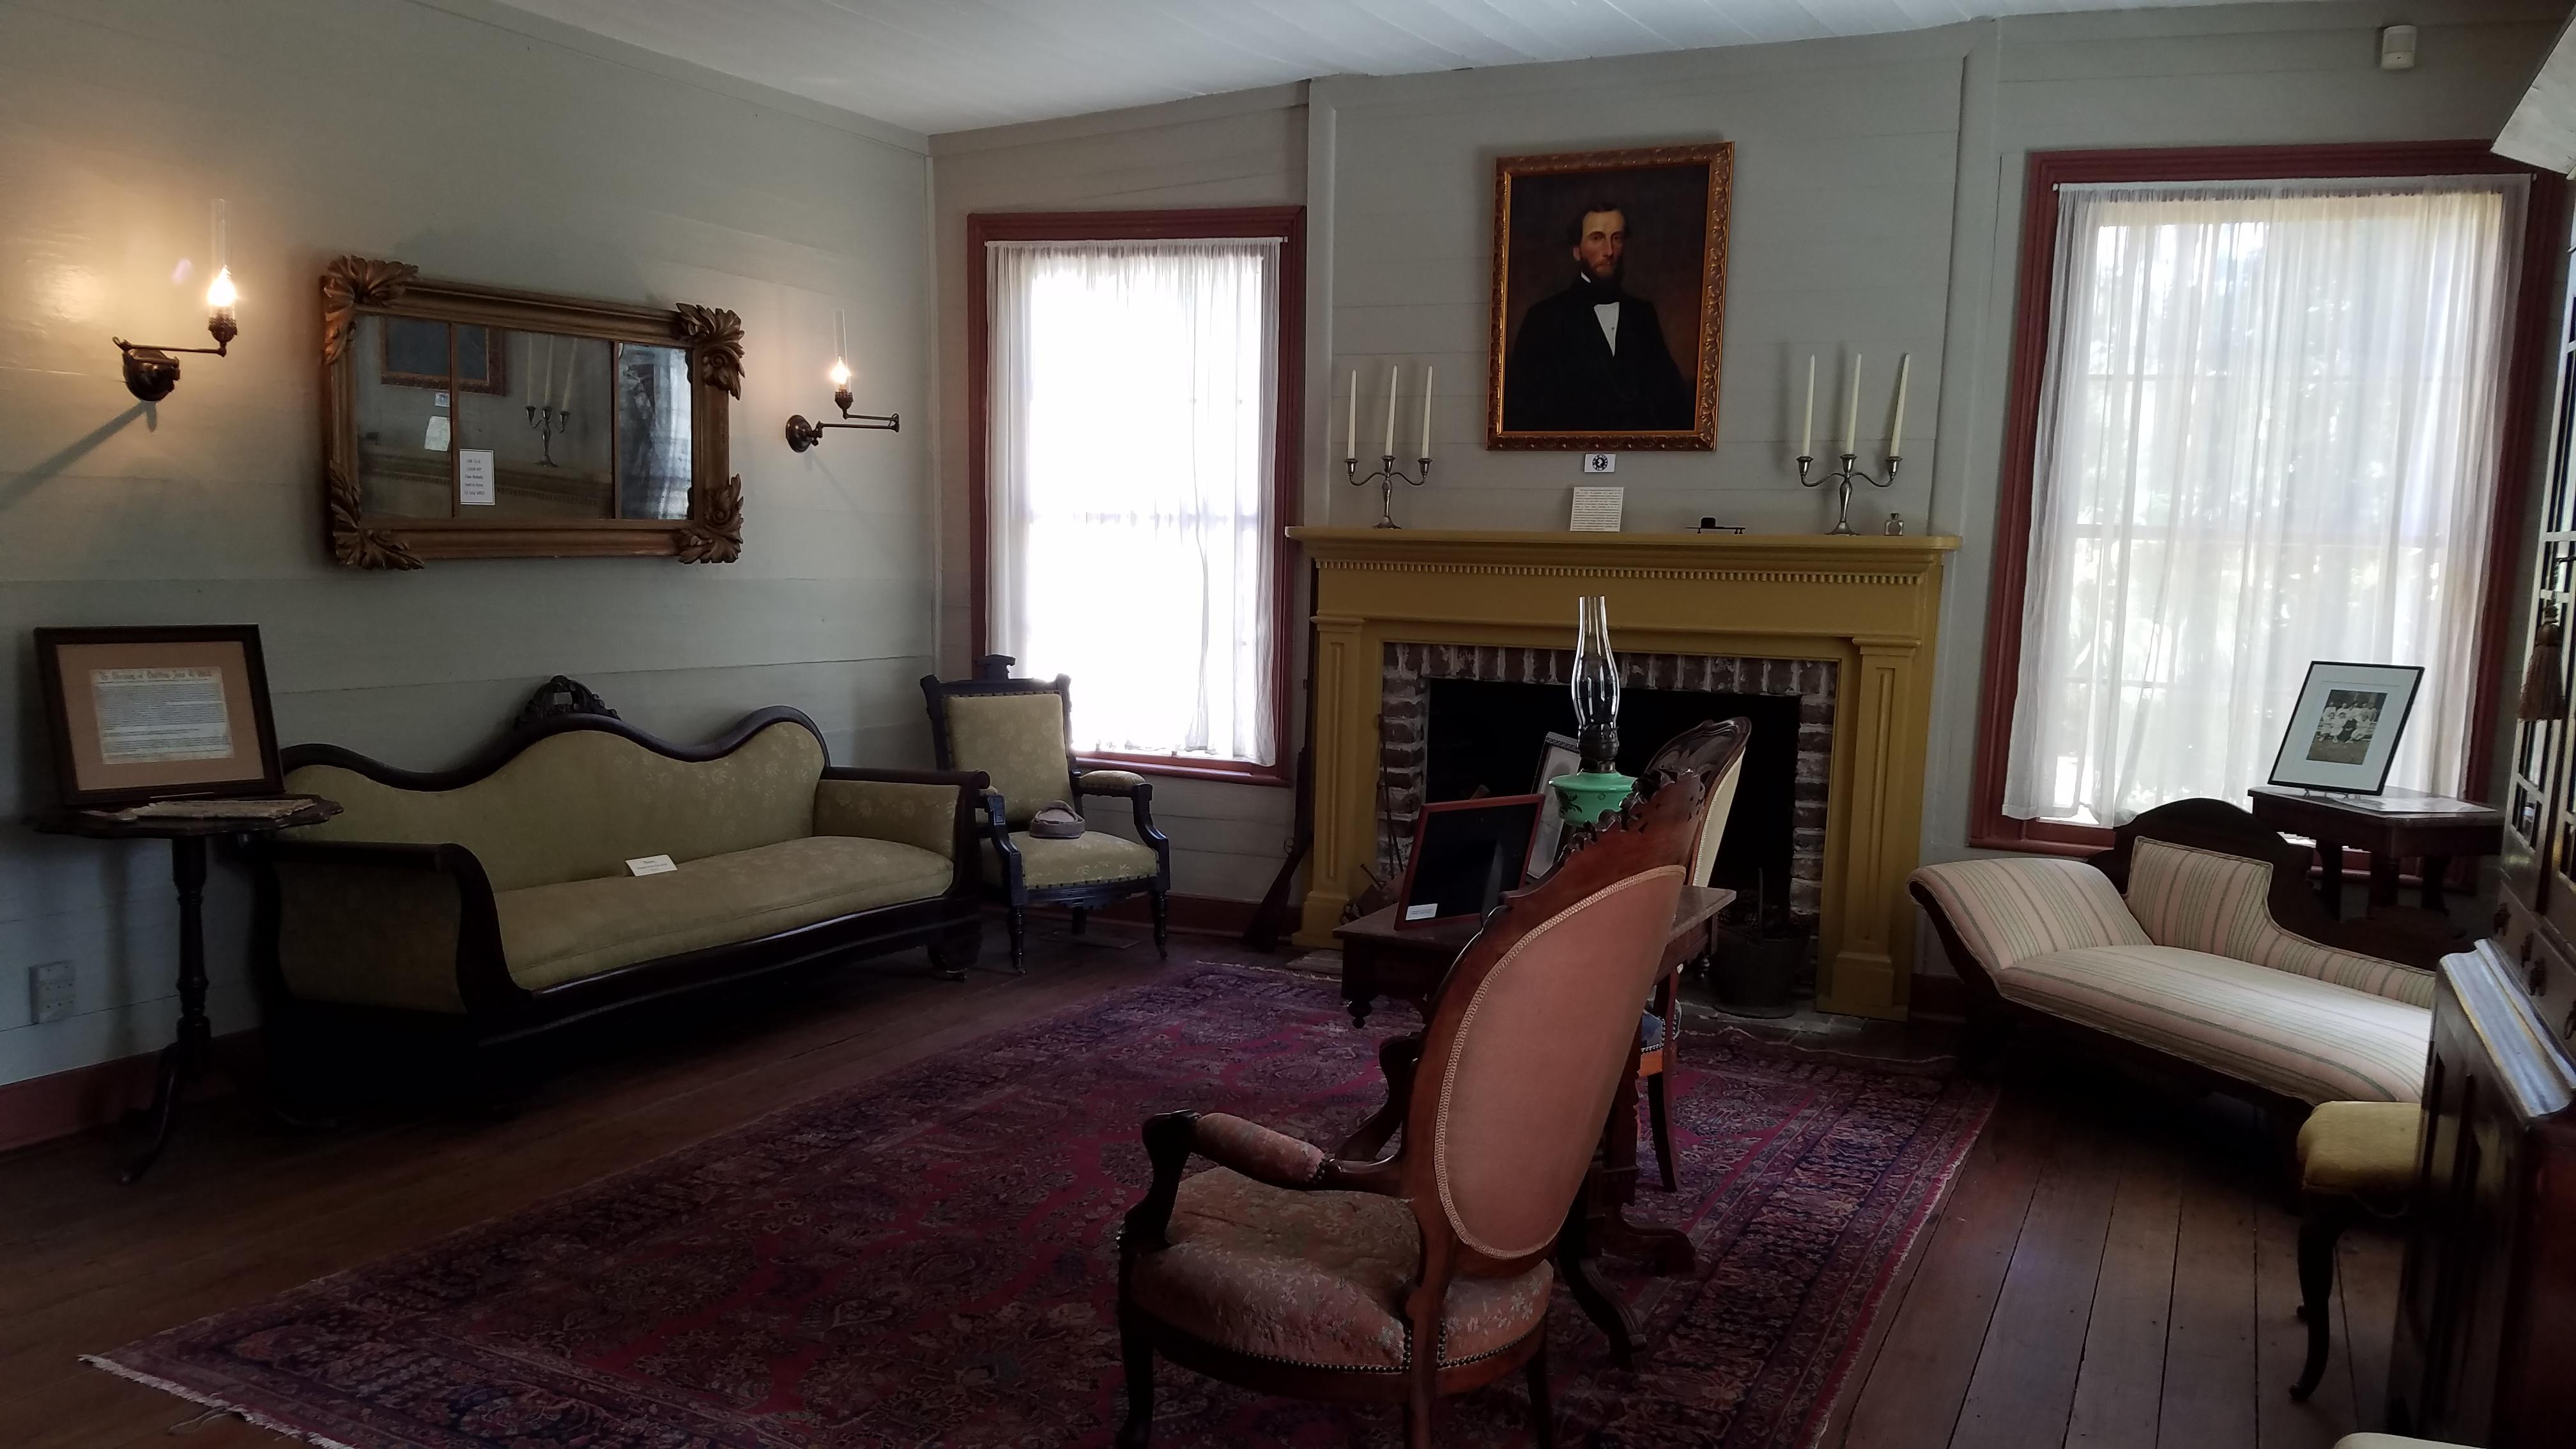 Heyward House, Museum, Welcome Center, Bluffton, South Carolina, Steve Wallace